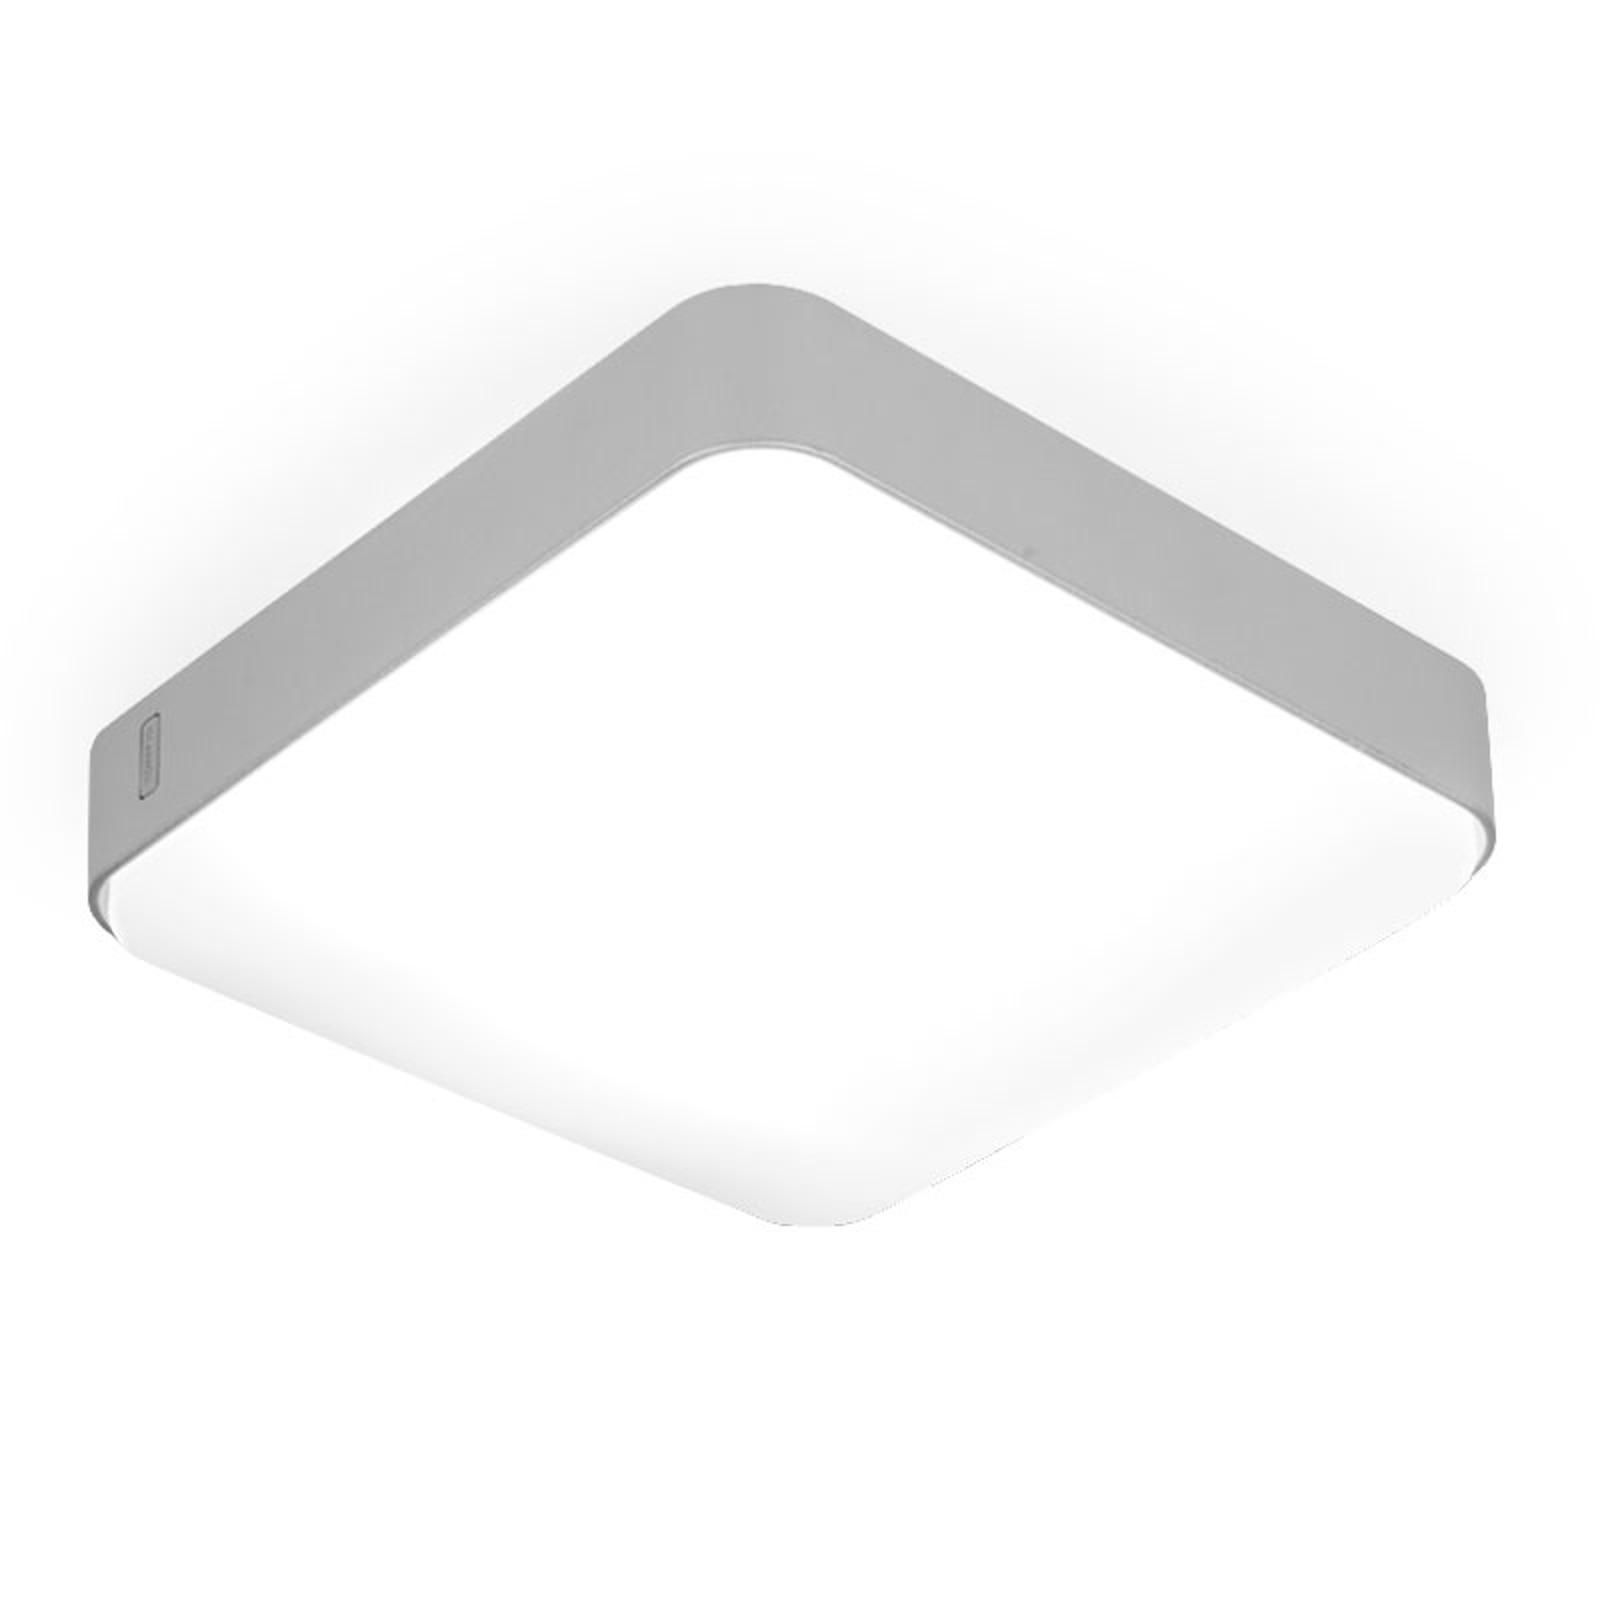 LED-kattovalaisin A20-SQ, 40 x 40 cm, 3 000 K